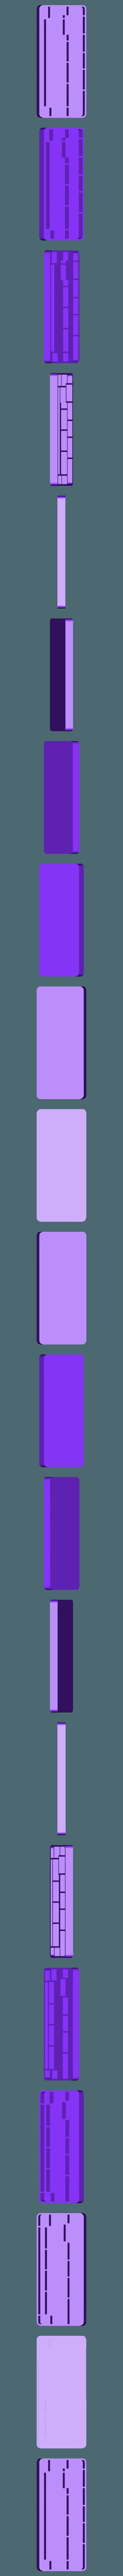 Phone_Body_small.stl Download free STL file iPhone repair tray • 3D printer design, MakeItWork